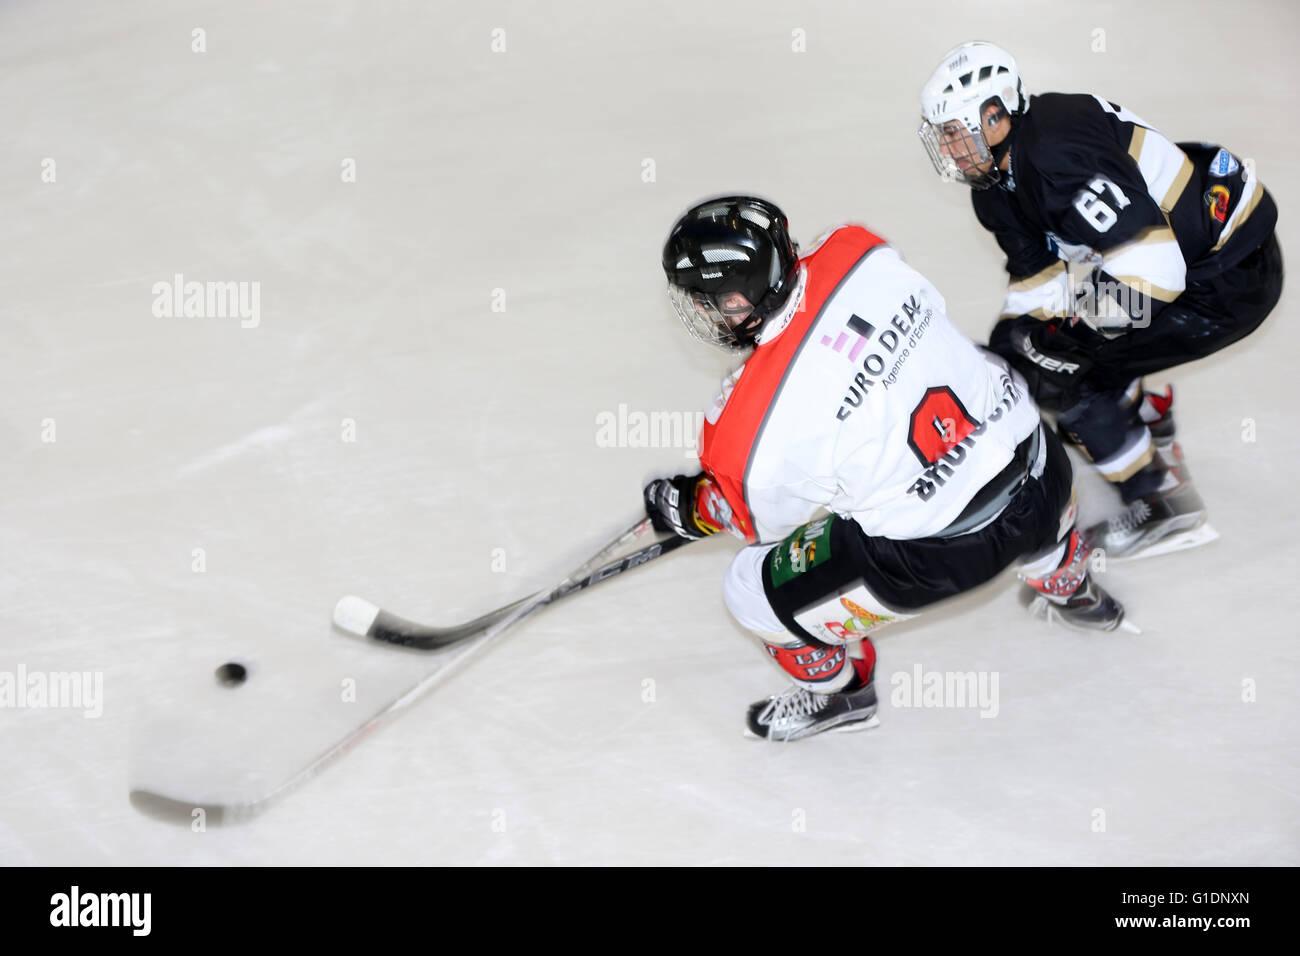 Ice Hockey match.  Mont-Blanc vs Amiens.  Saint-Gervais-les-Bains. France. - Stock Image